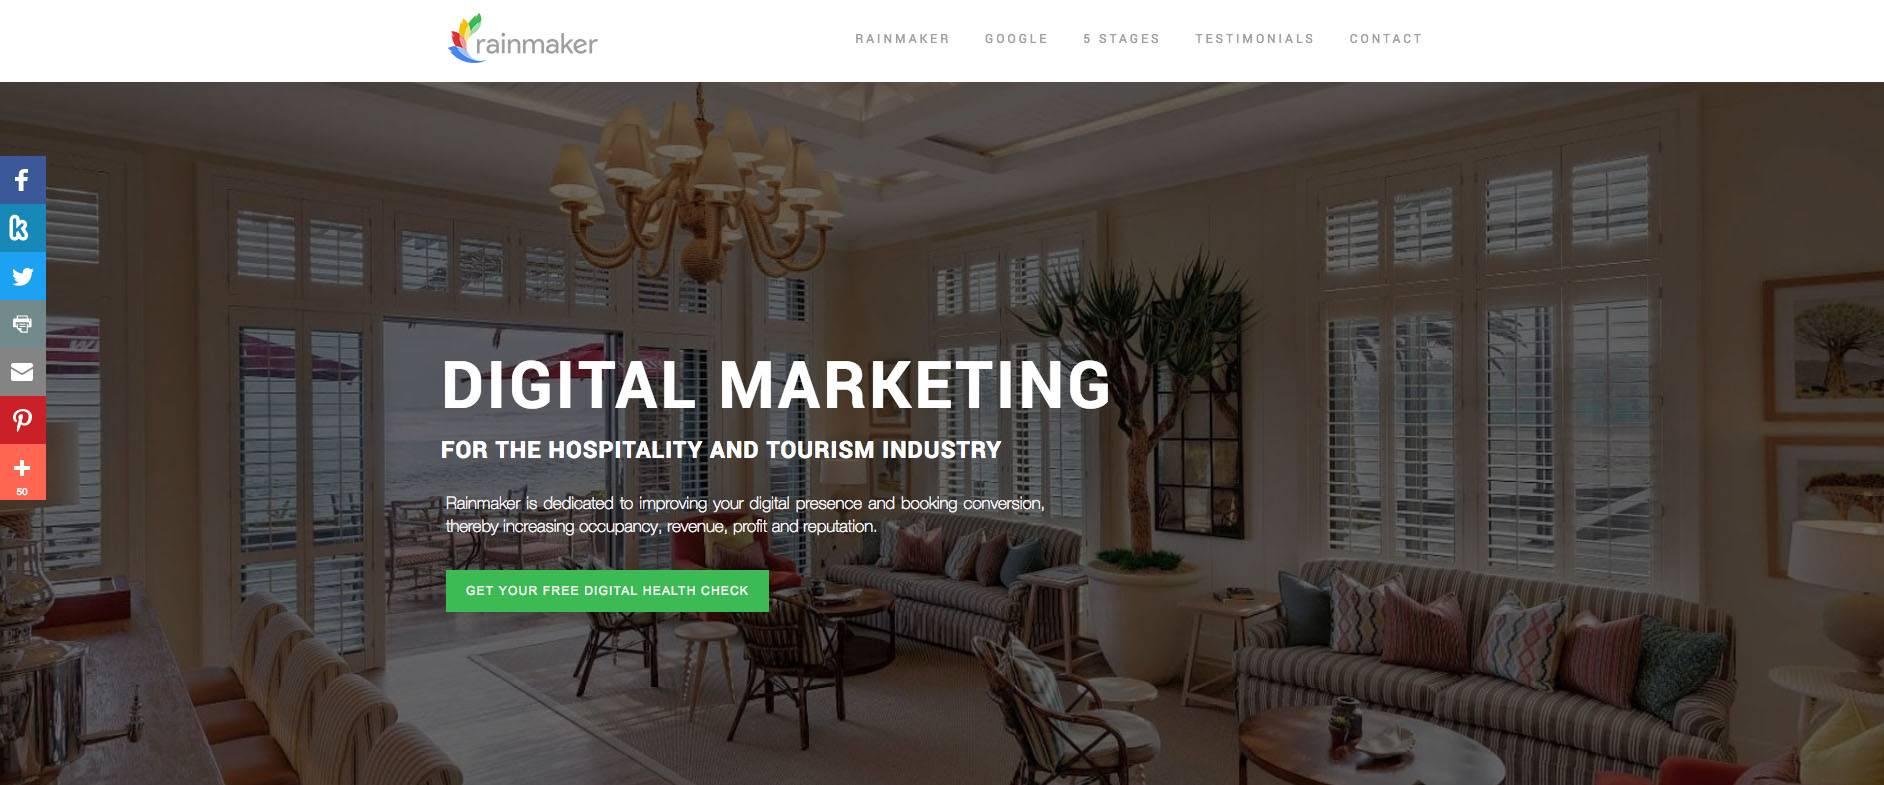 Tidy - The sitebuilder for professionals - rainmaker digital